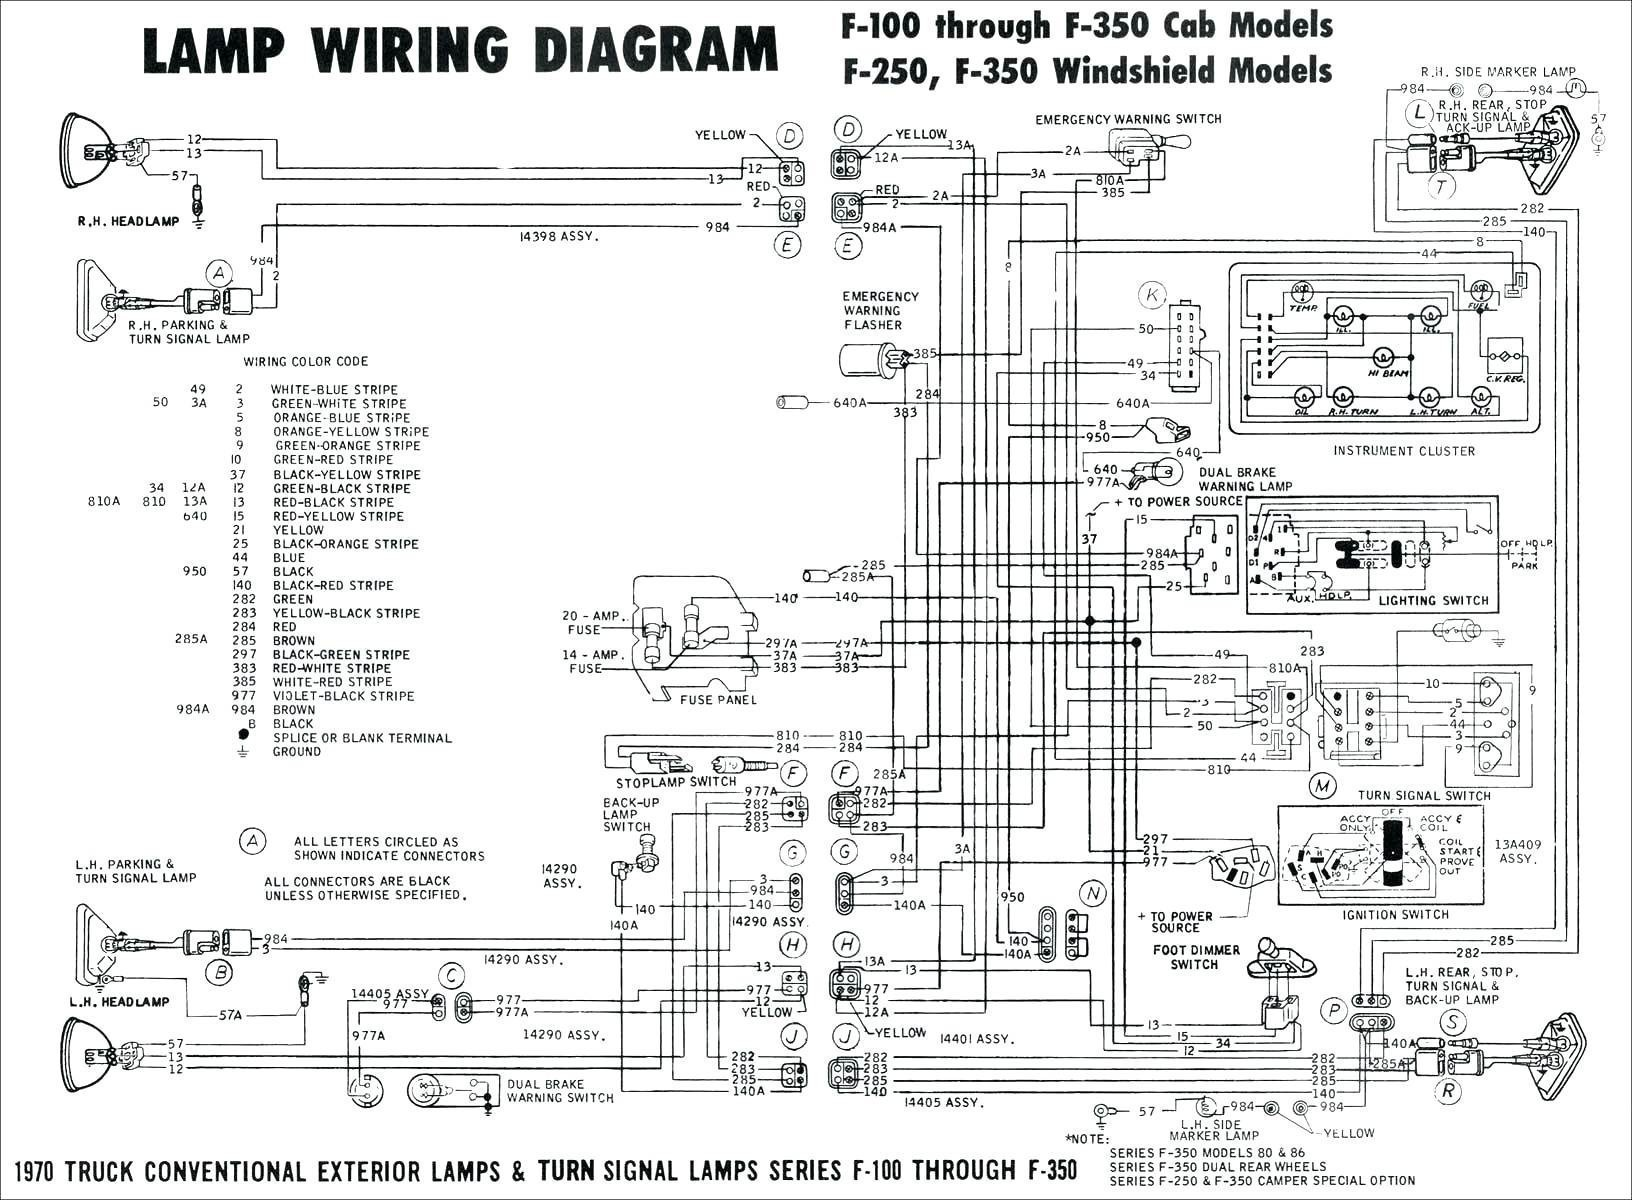 Mazda 323 Engine Diagram 1993 Mazda Miata Fuse Diagram Another Blog About Wiring Diagram • Of Mazda 323 Engine Diagram